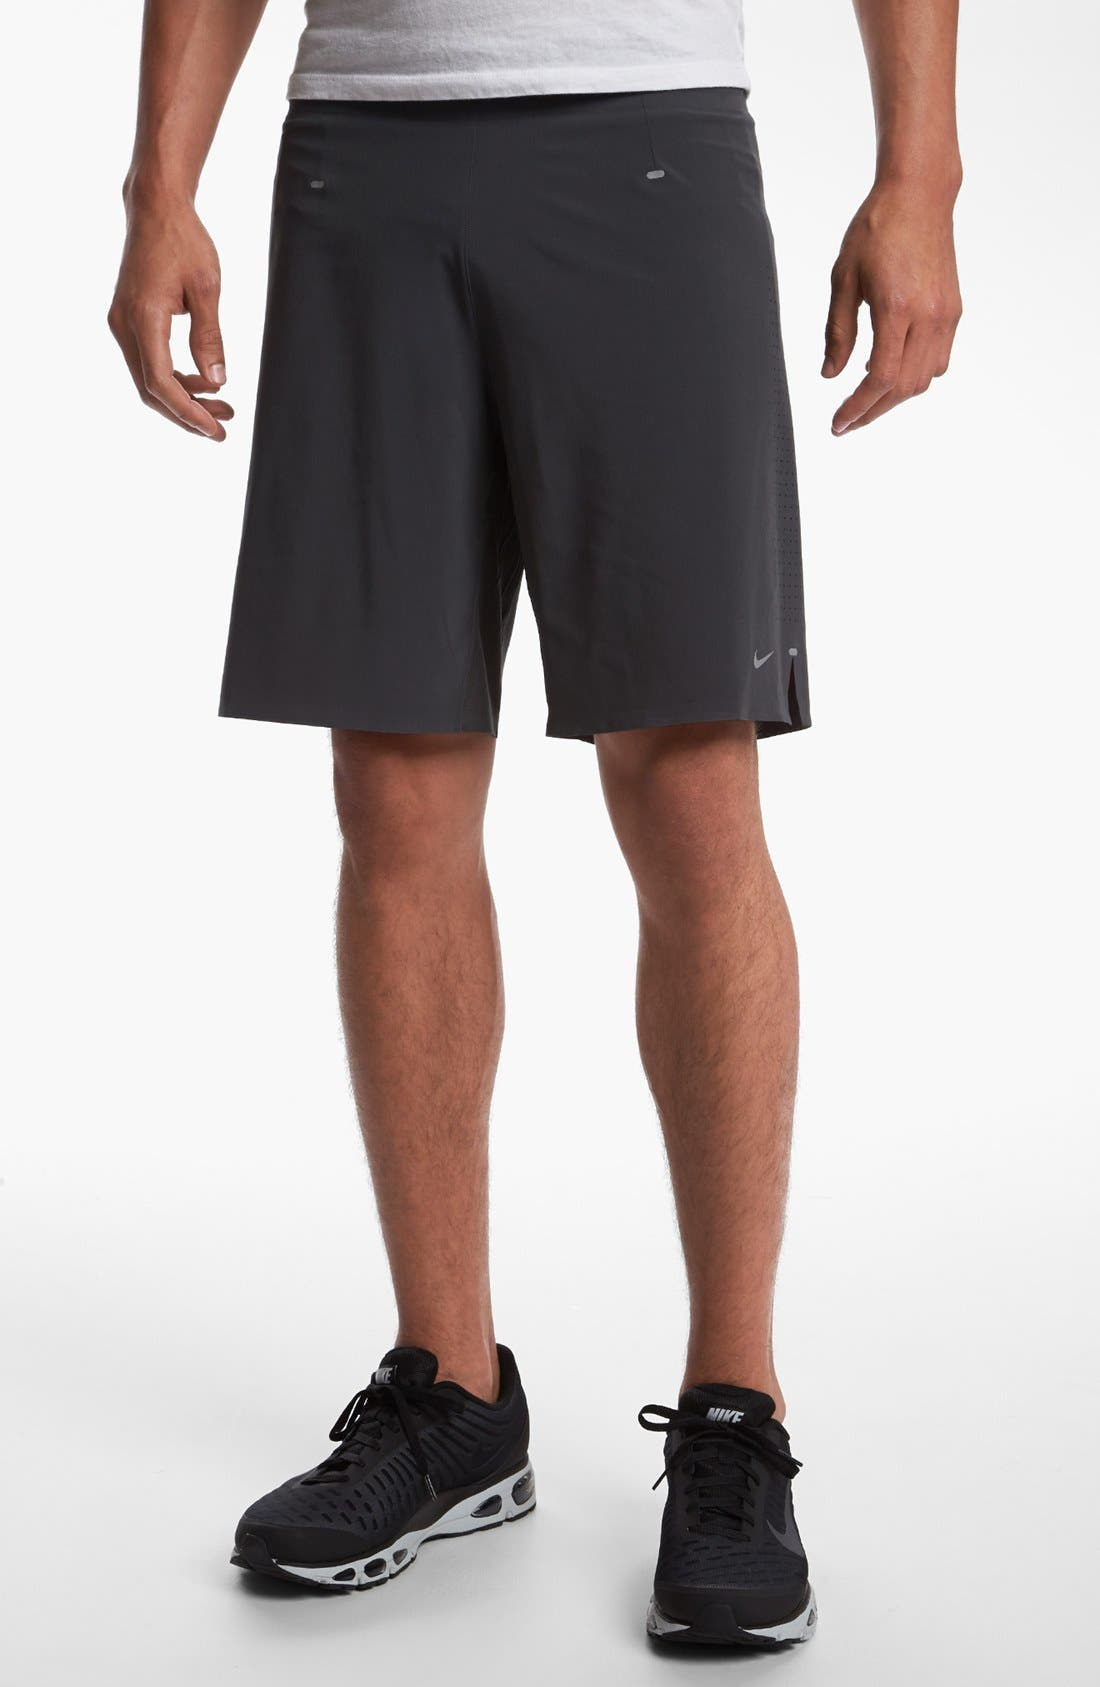 Main Image - Nike 'Instinct' Stretch Woven Running Shorts